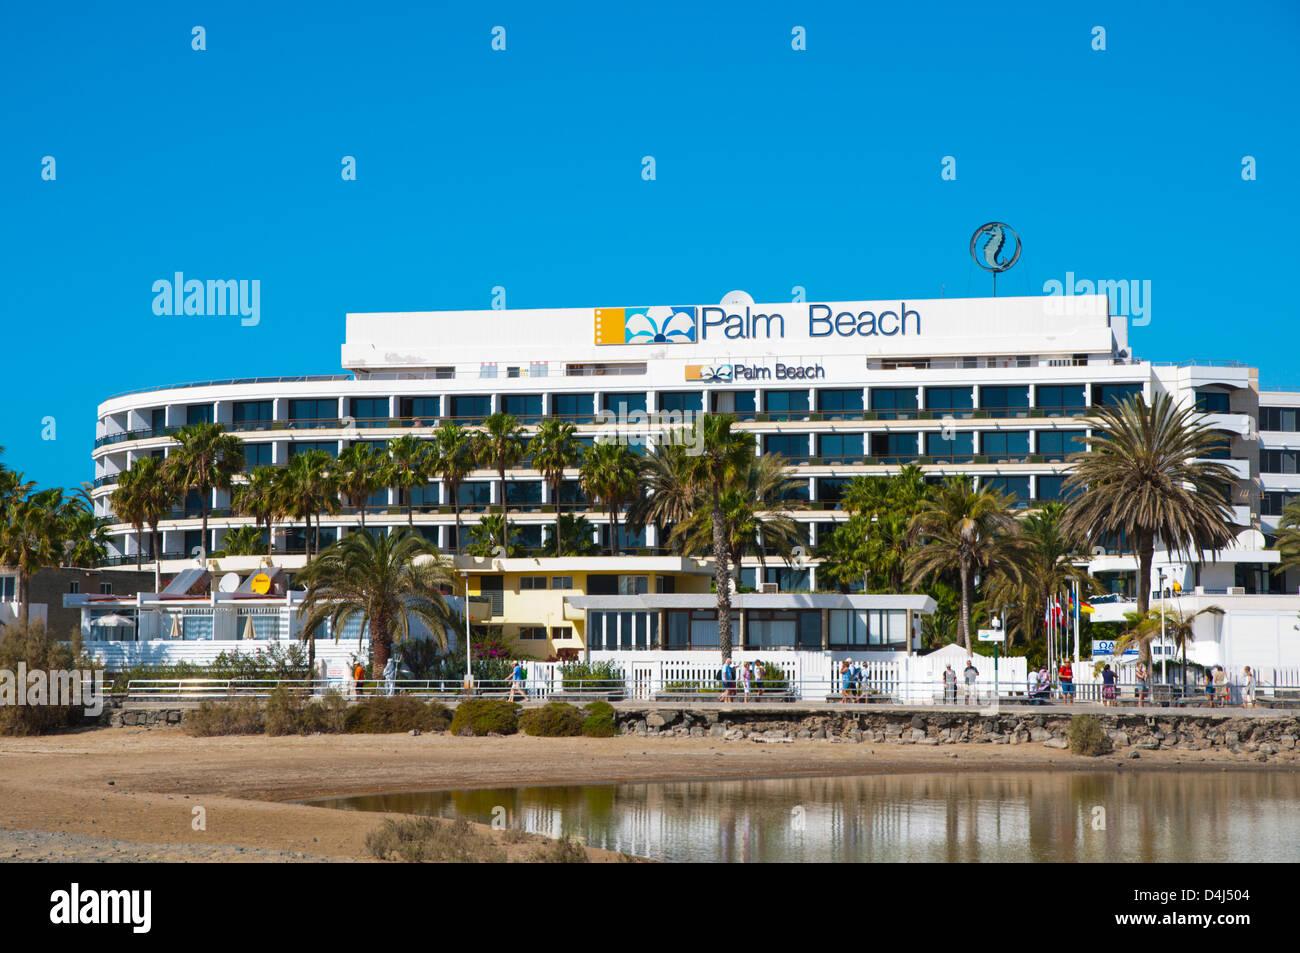 Hotel Palm Beach Maspalomas